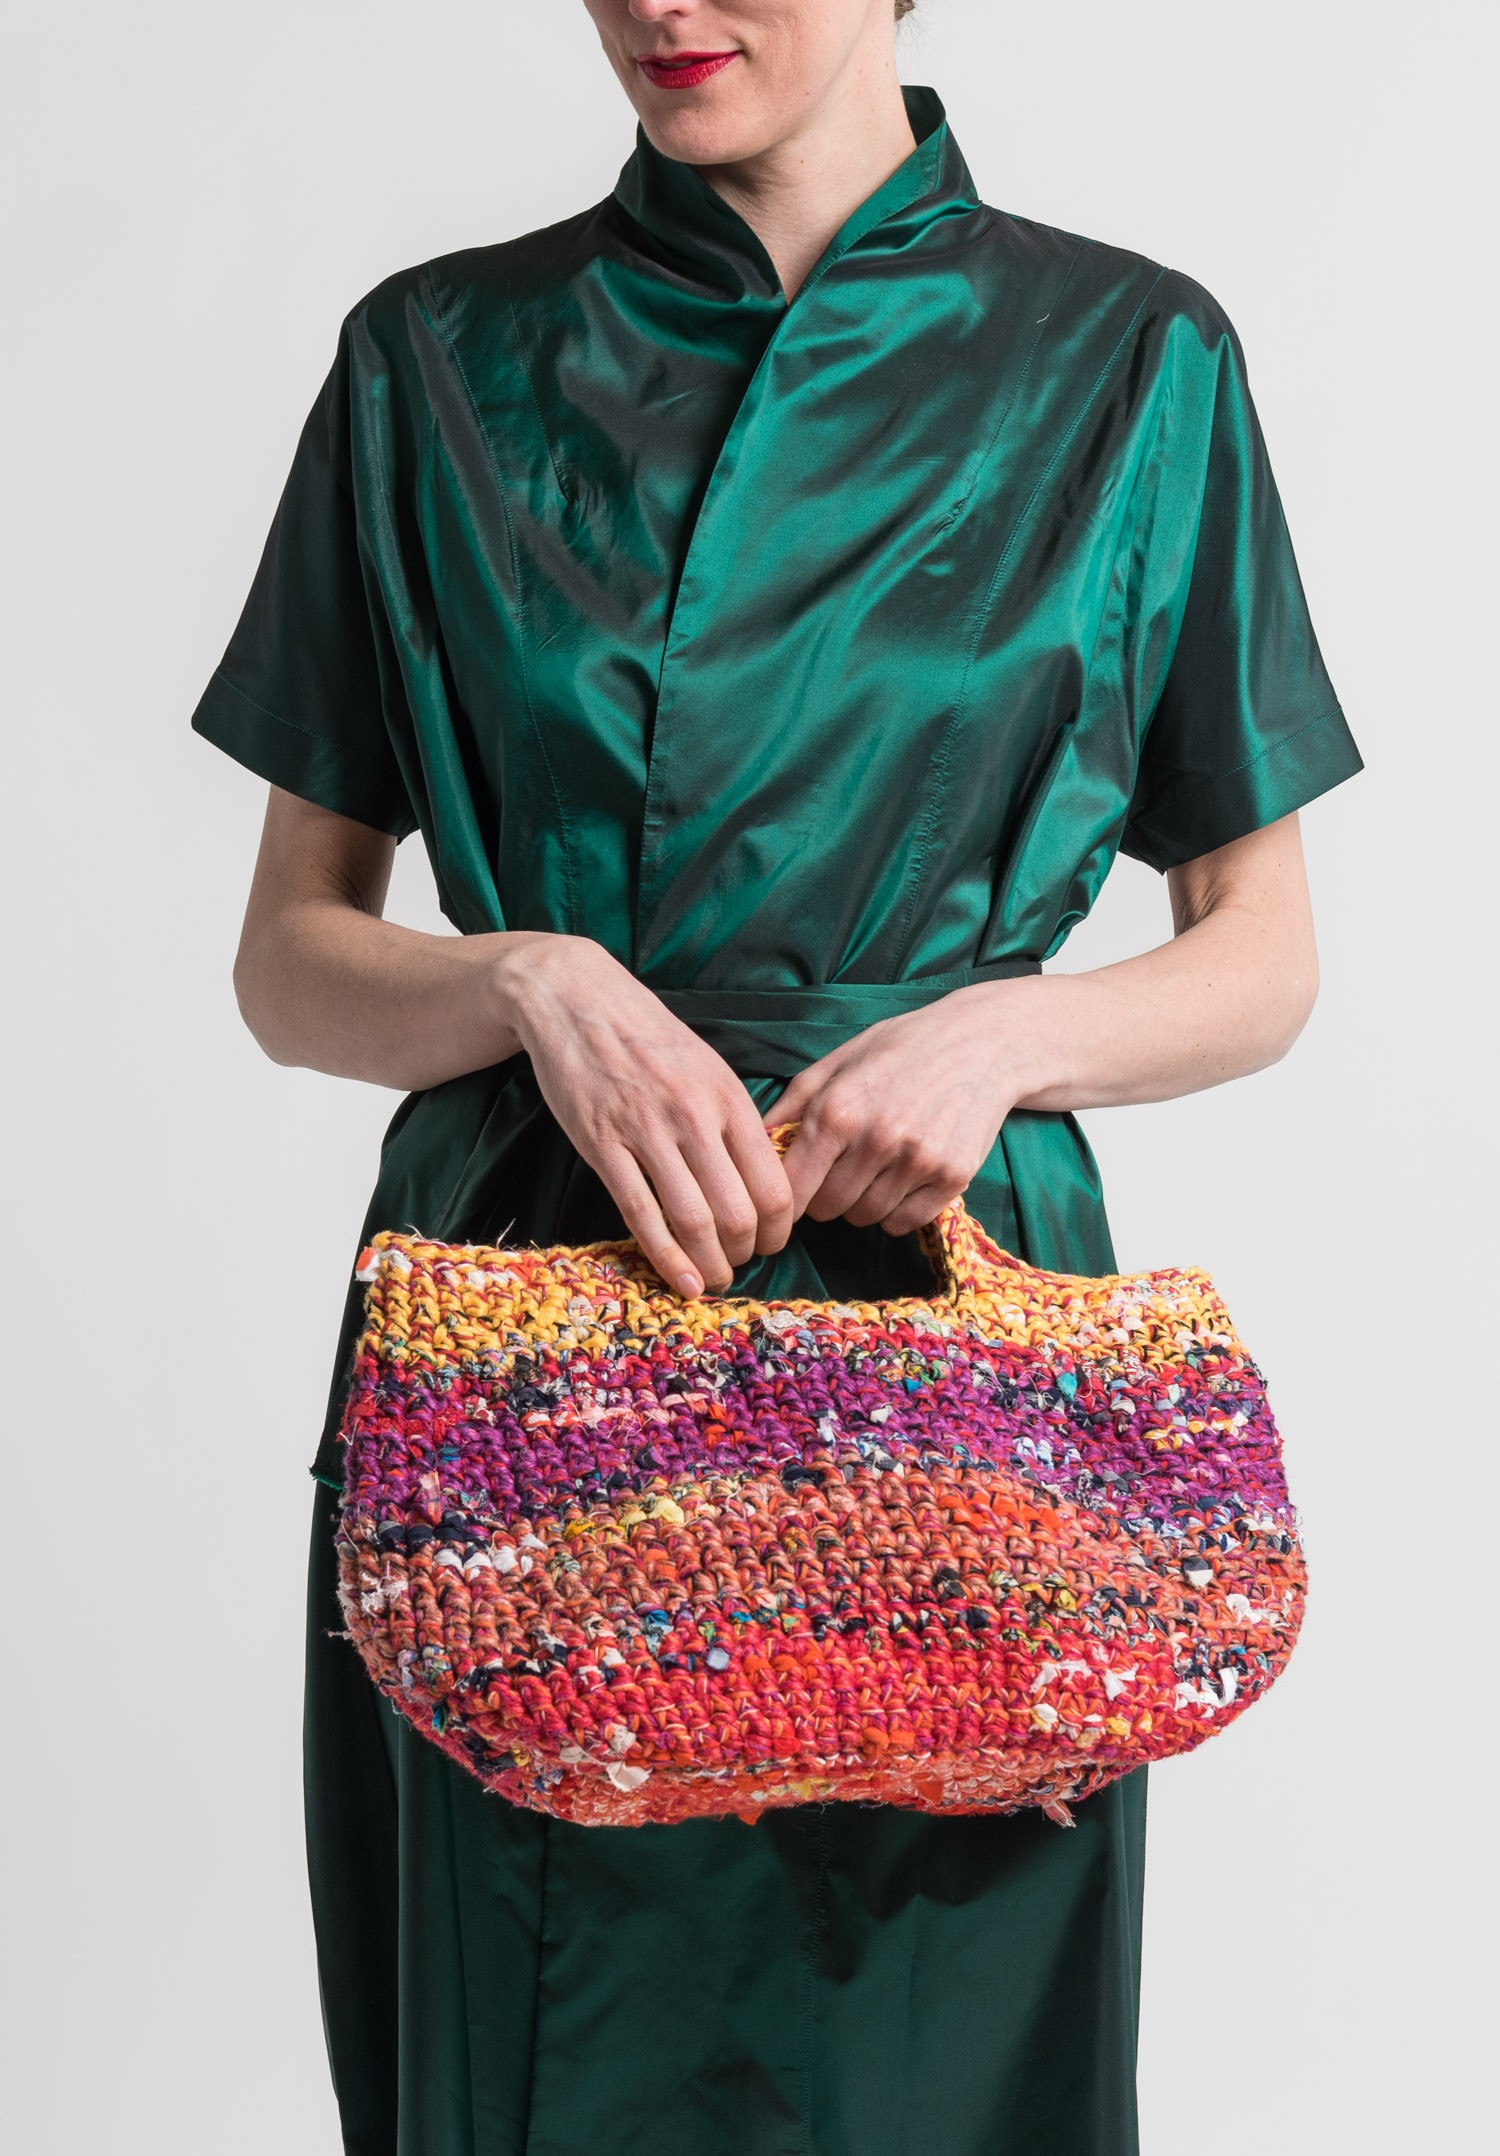 aaeaafe5314 Daniela Gregis Crocheted Cotton/Linen Bag in Multicolor | Santa Fe ...